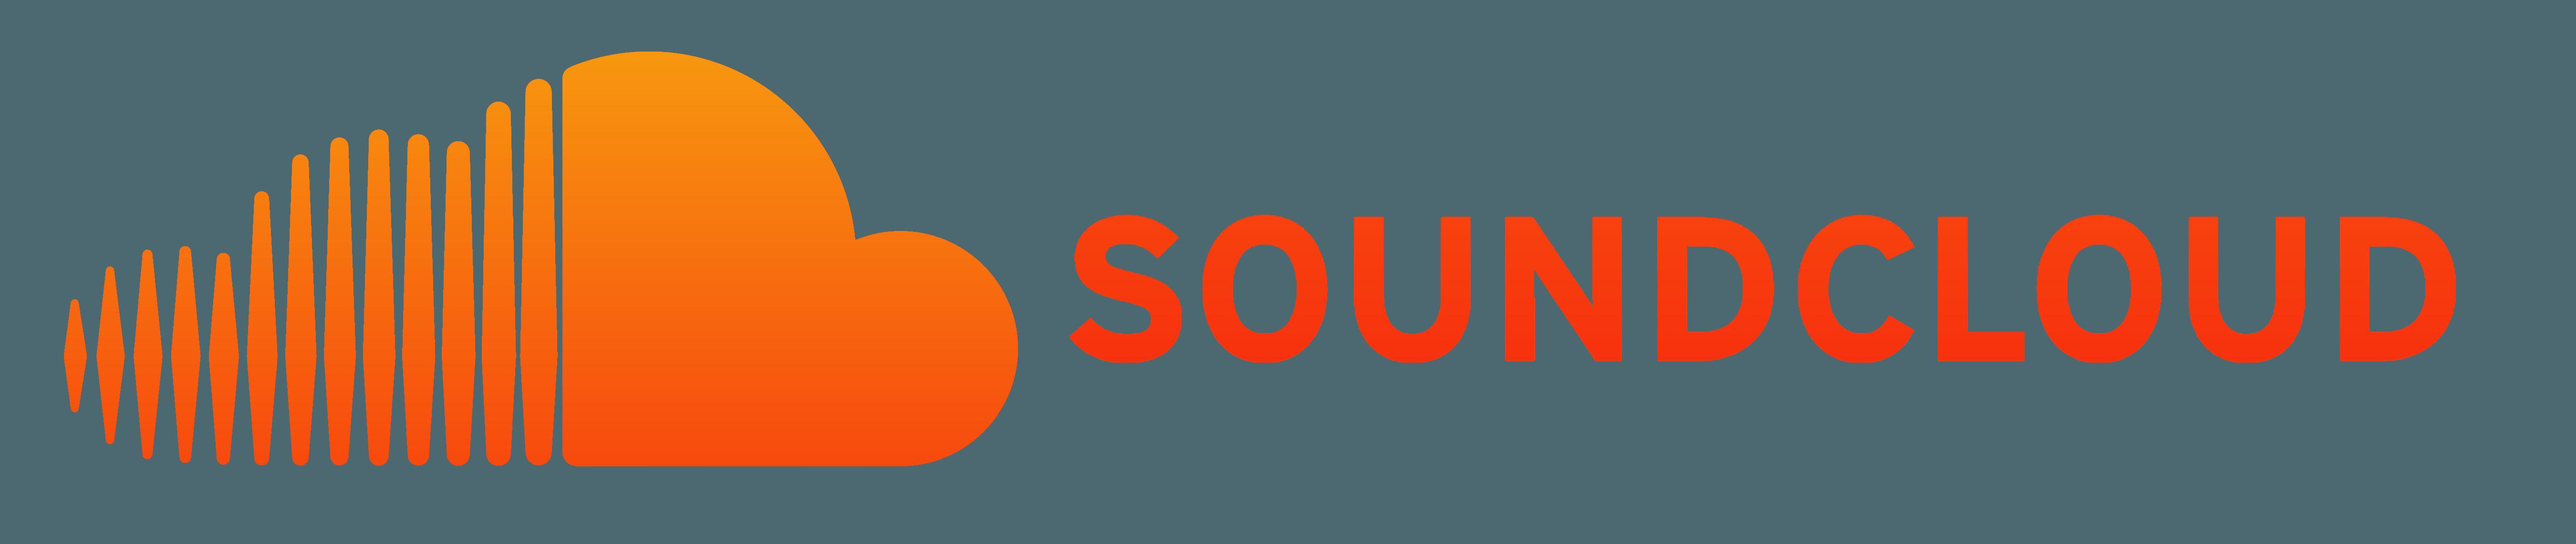 Transparent SoundCloud Logo - LogoDix